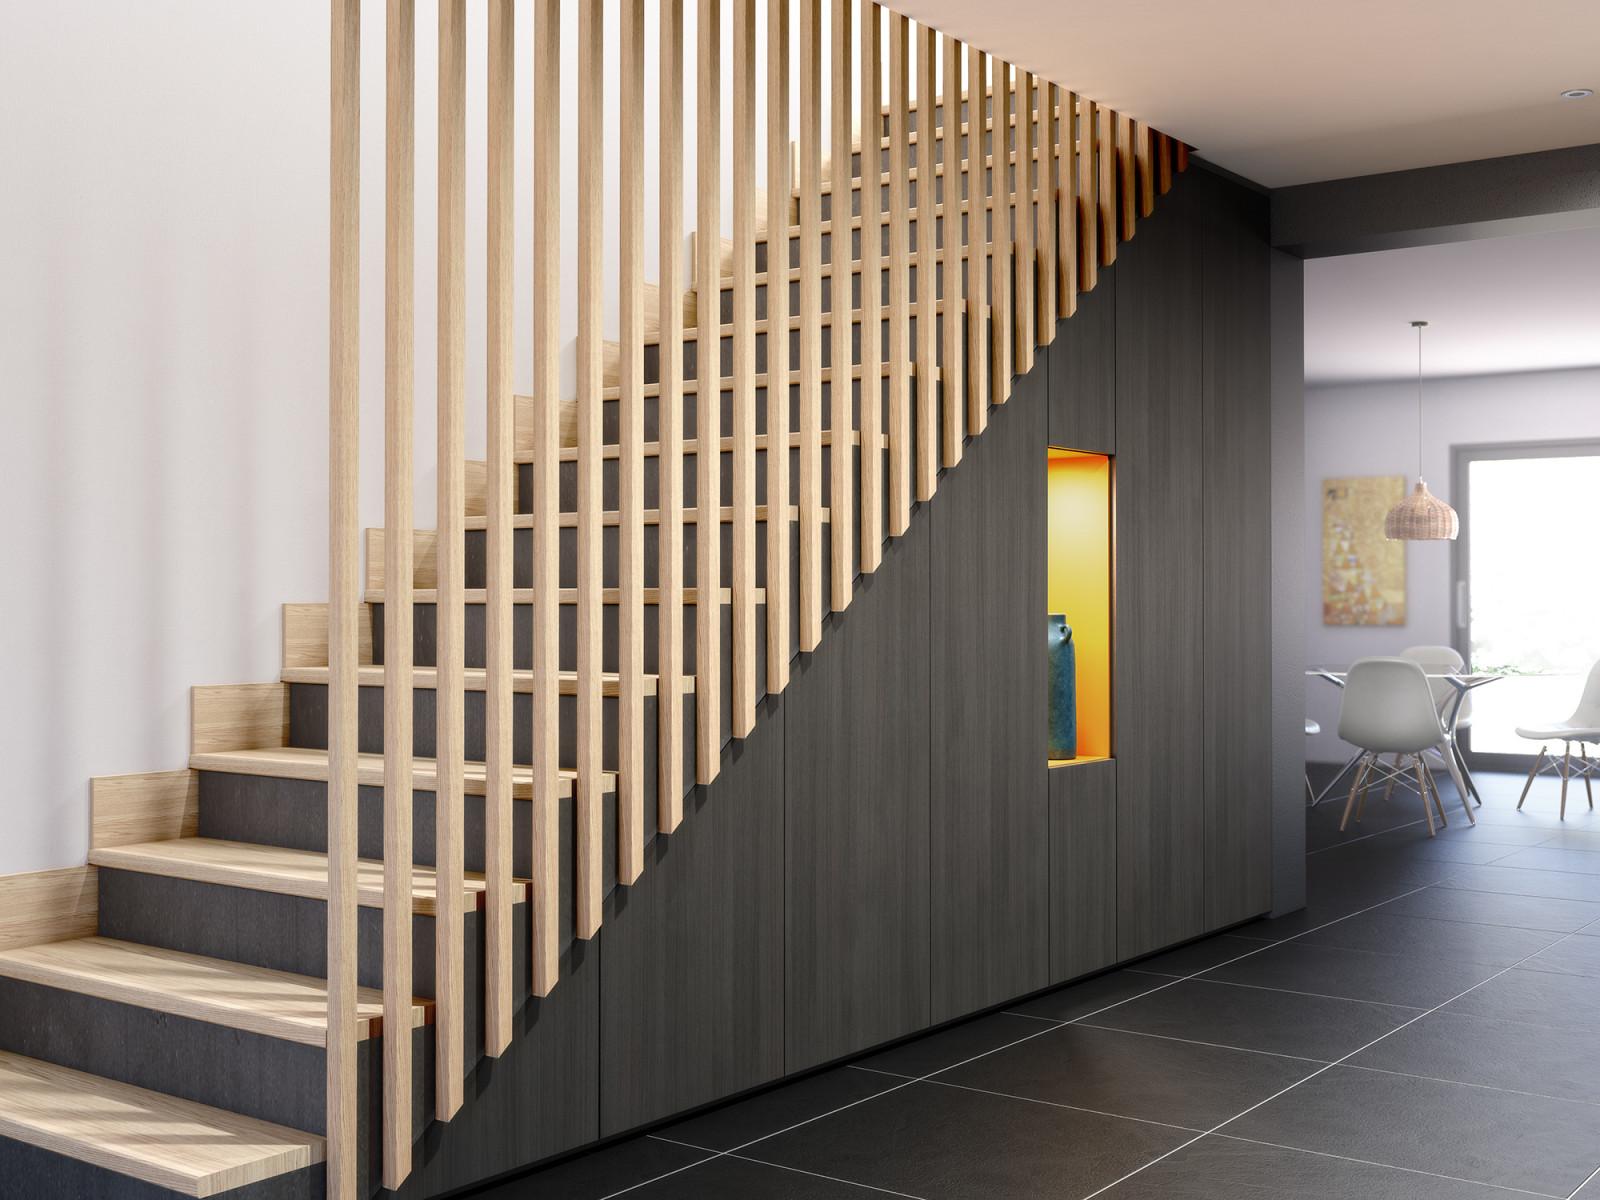 ss-escalier_ton-bois_380x260